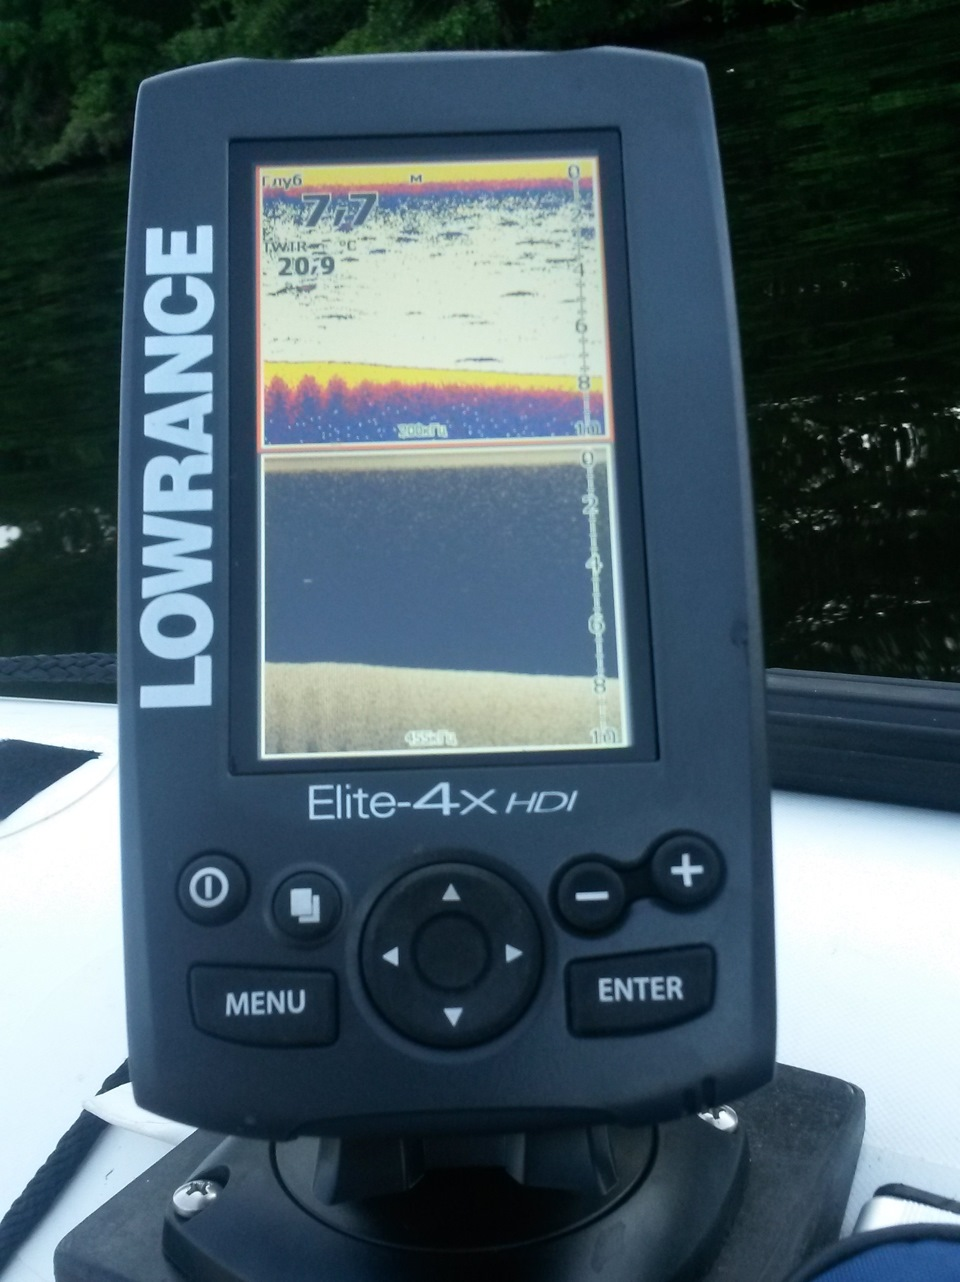 Lowrance Elite-4 HDI Gold 83/200 455/800 Эхолот картплоттер из Новосибирска